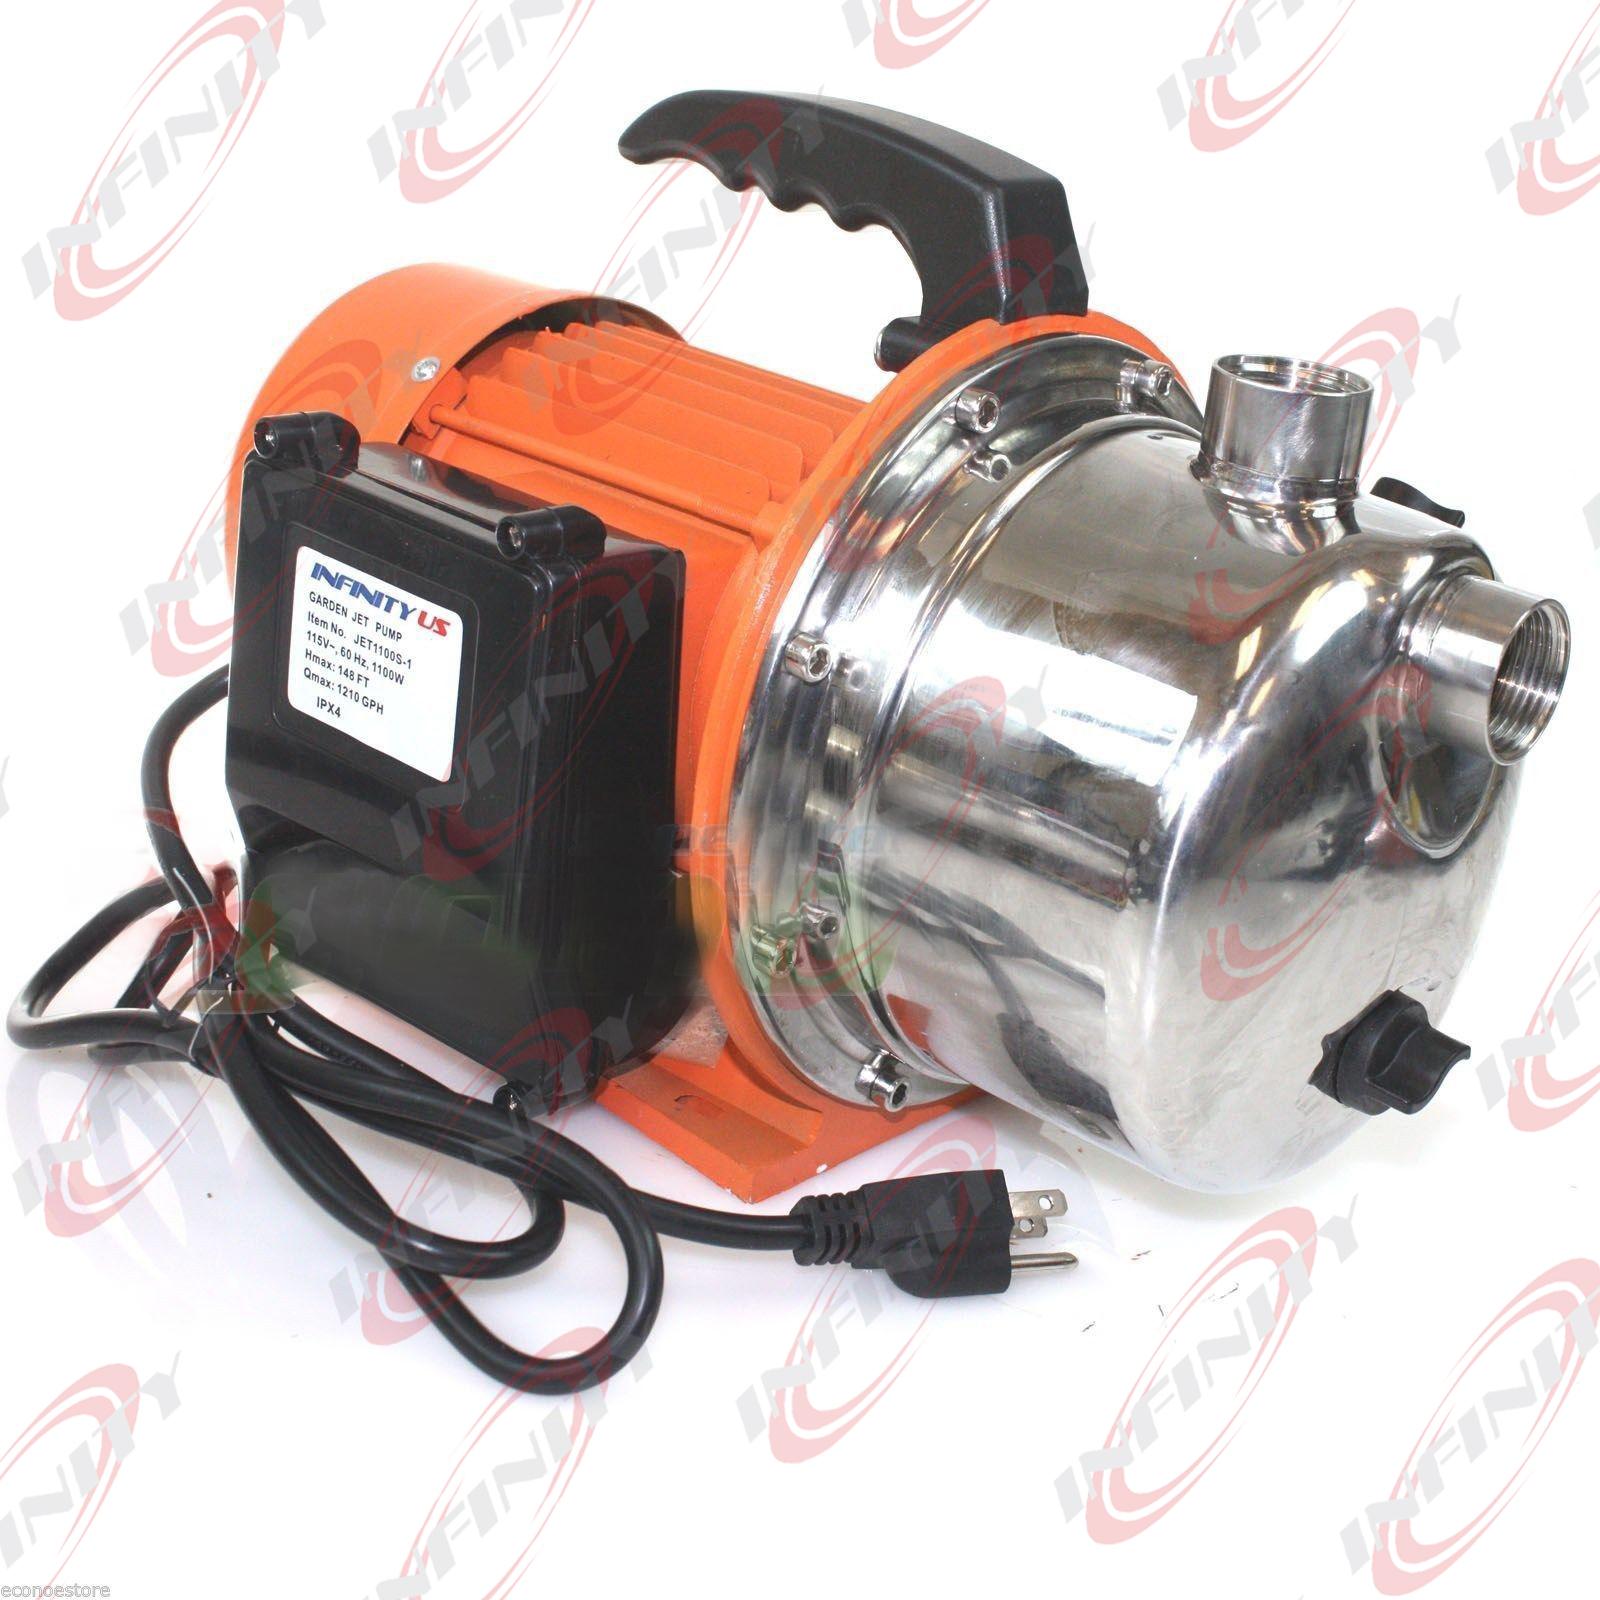 1.6HP Electric Pump Water Jet Garden Shallow Well Pressure 1600W